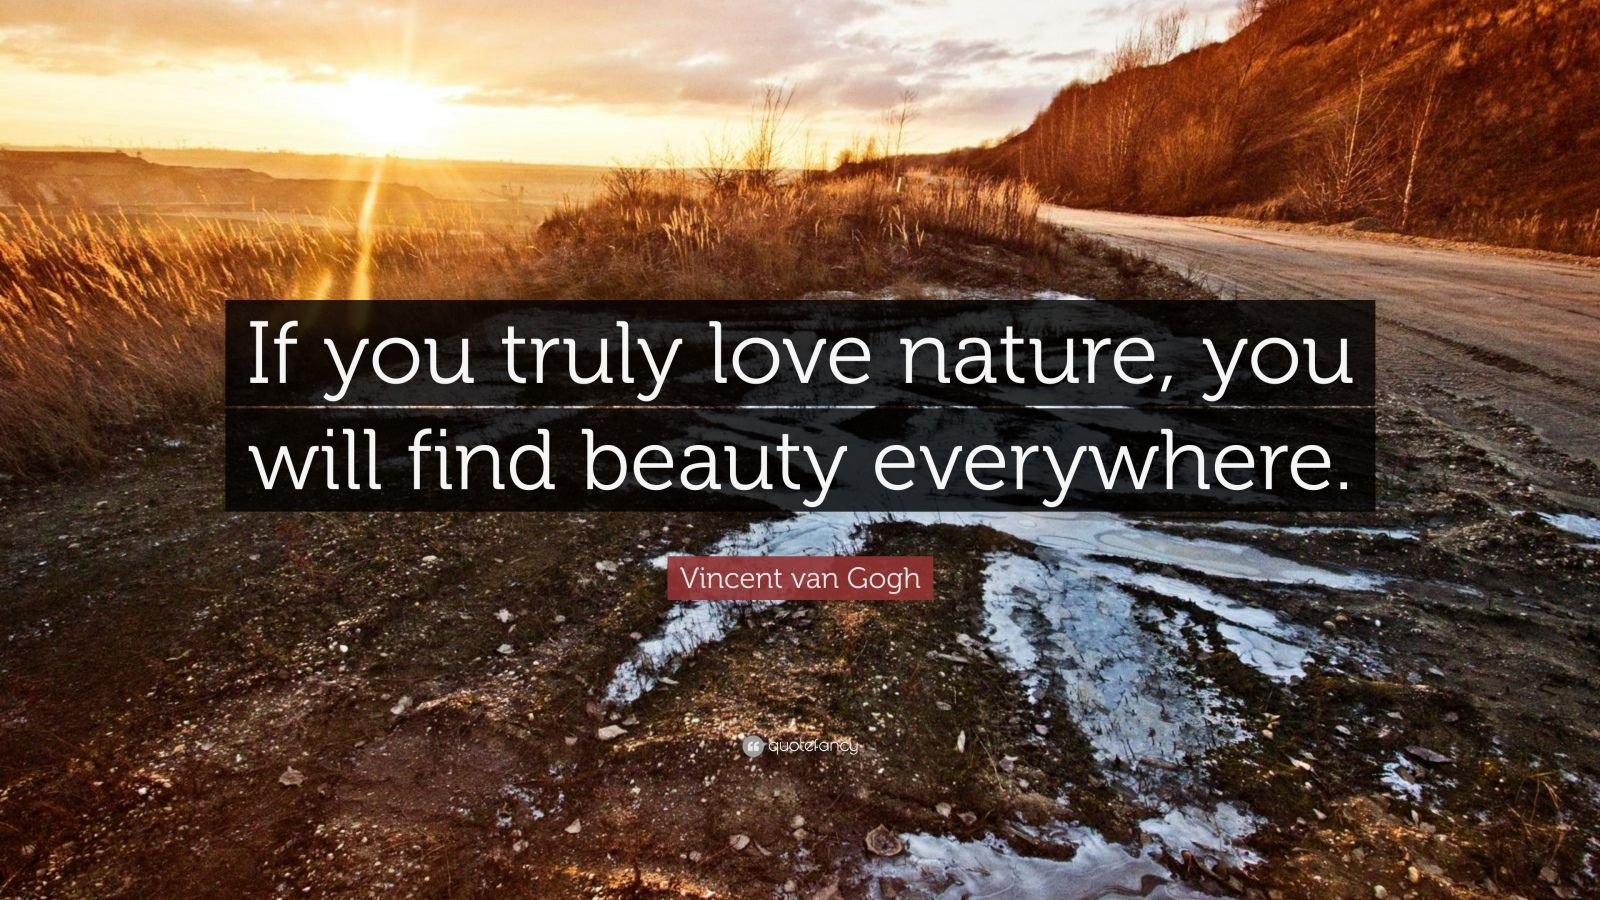 Vincent Van Gogh Quotes Wallpaper Vincent Van Gogh Quote If You Truly Love Nature You